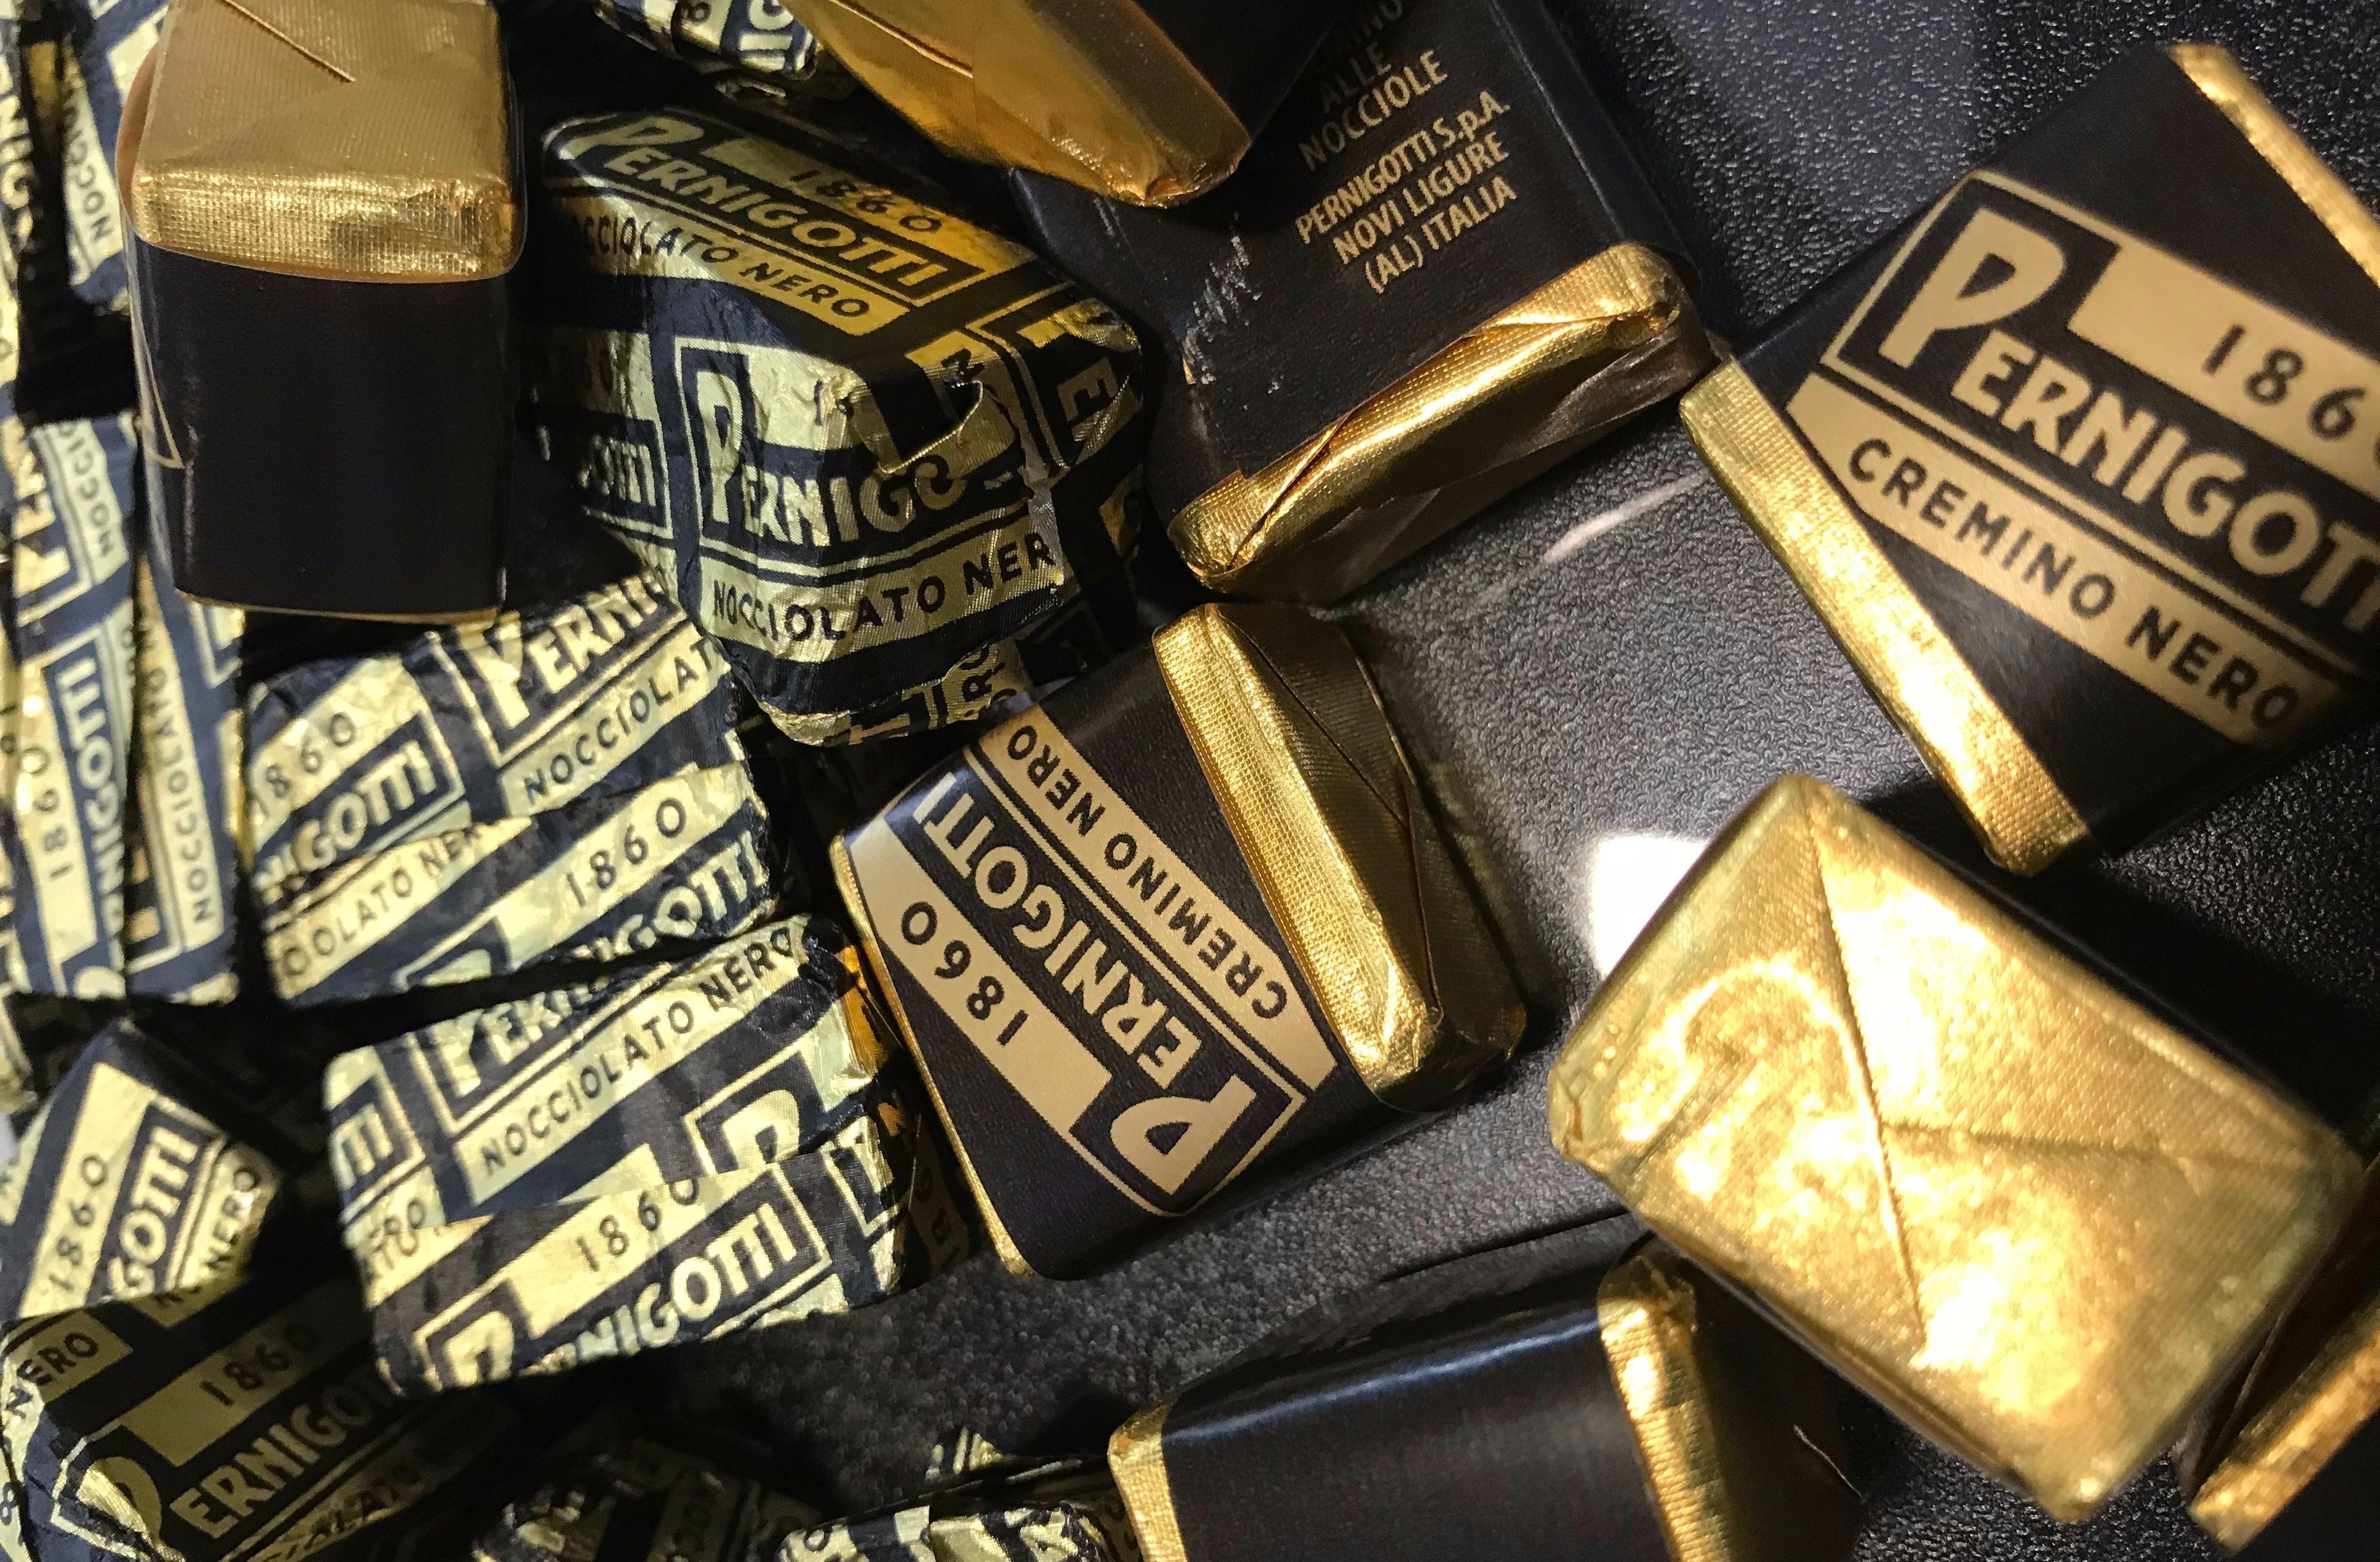 Pernigot chocolates at Kosherfest 2017.